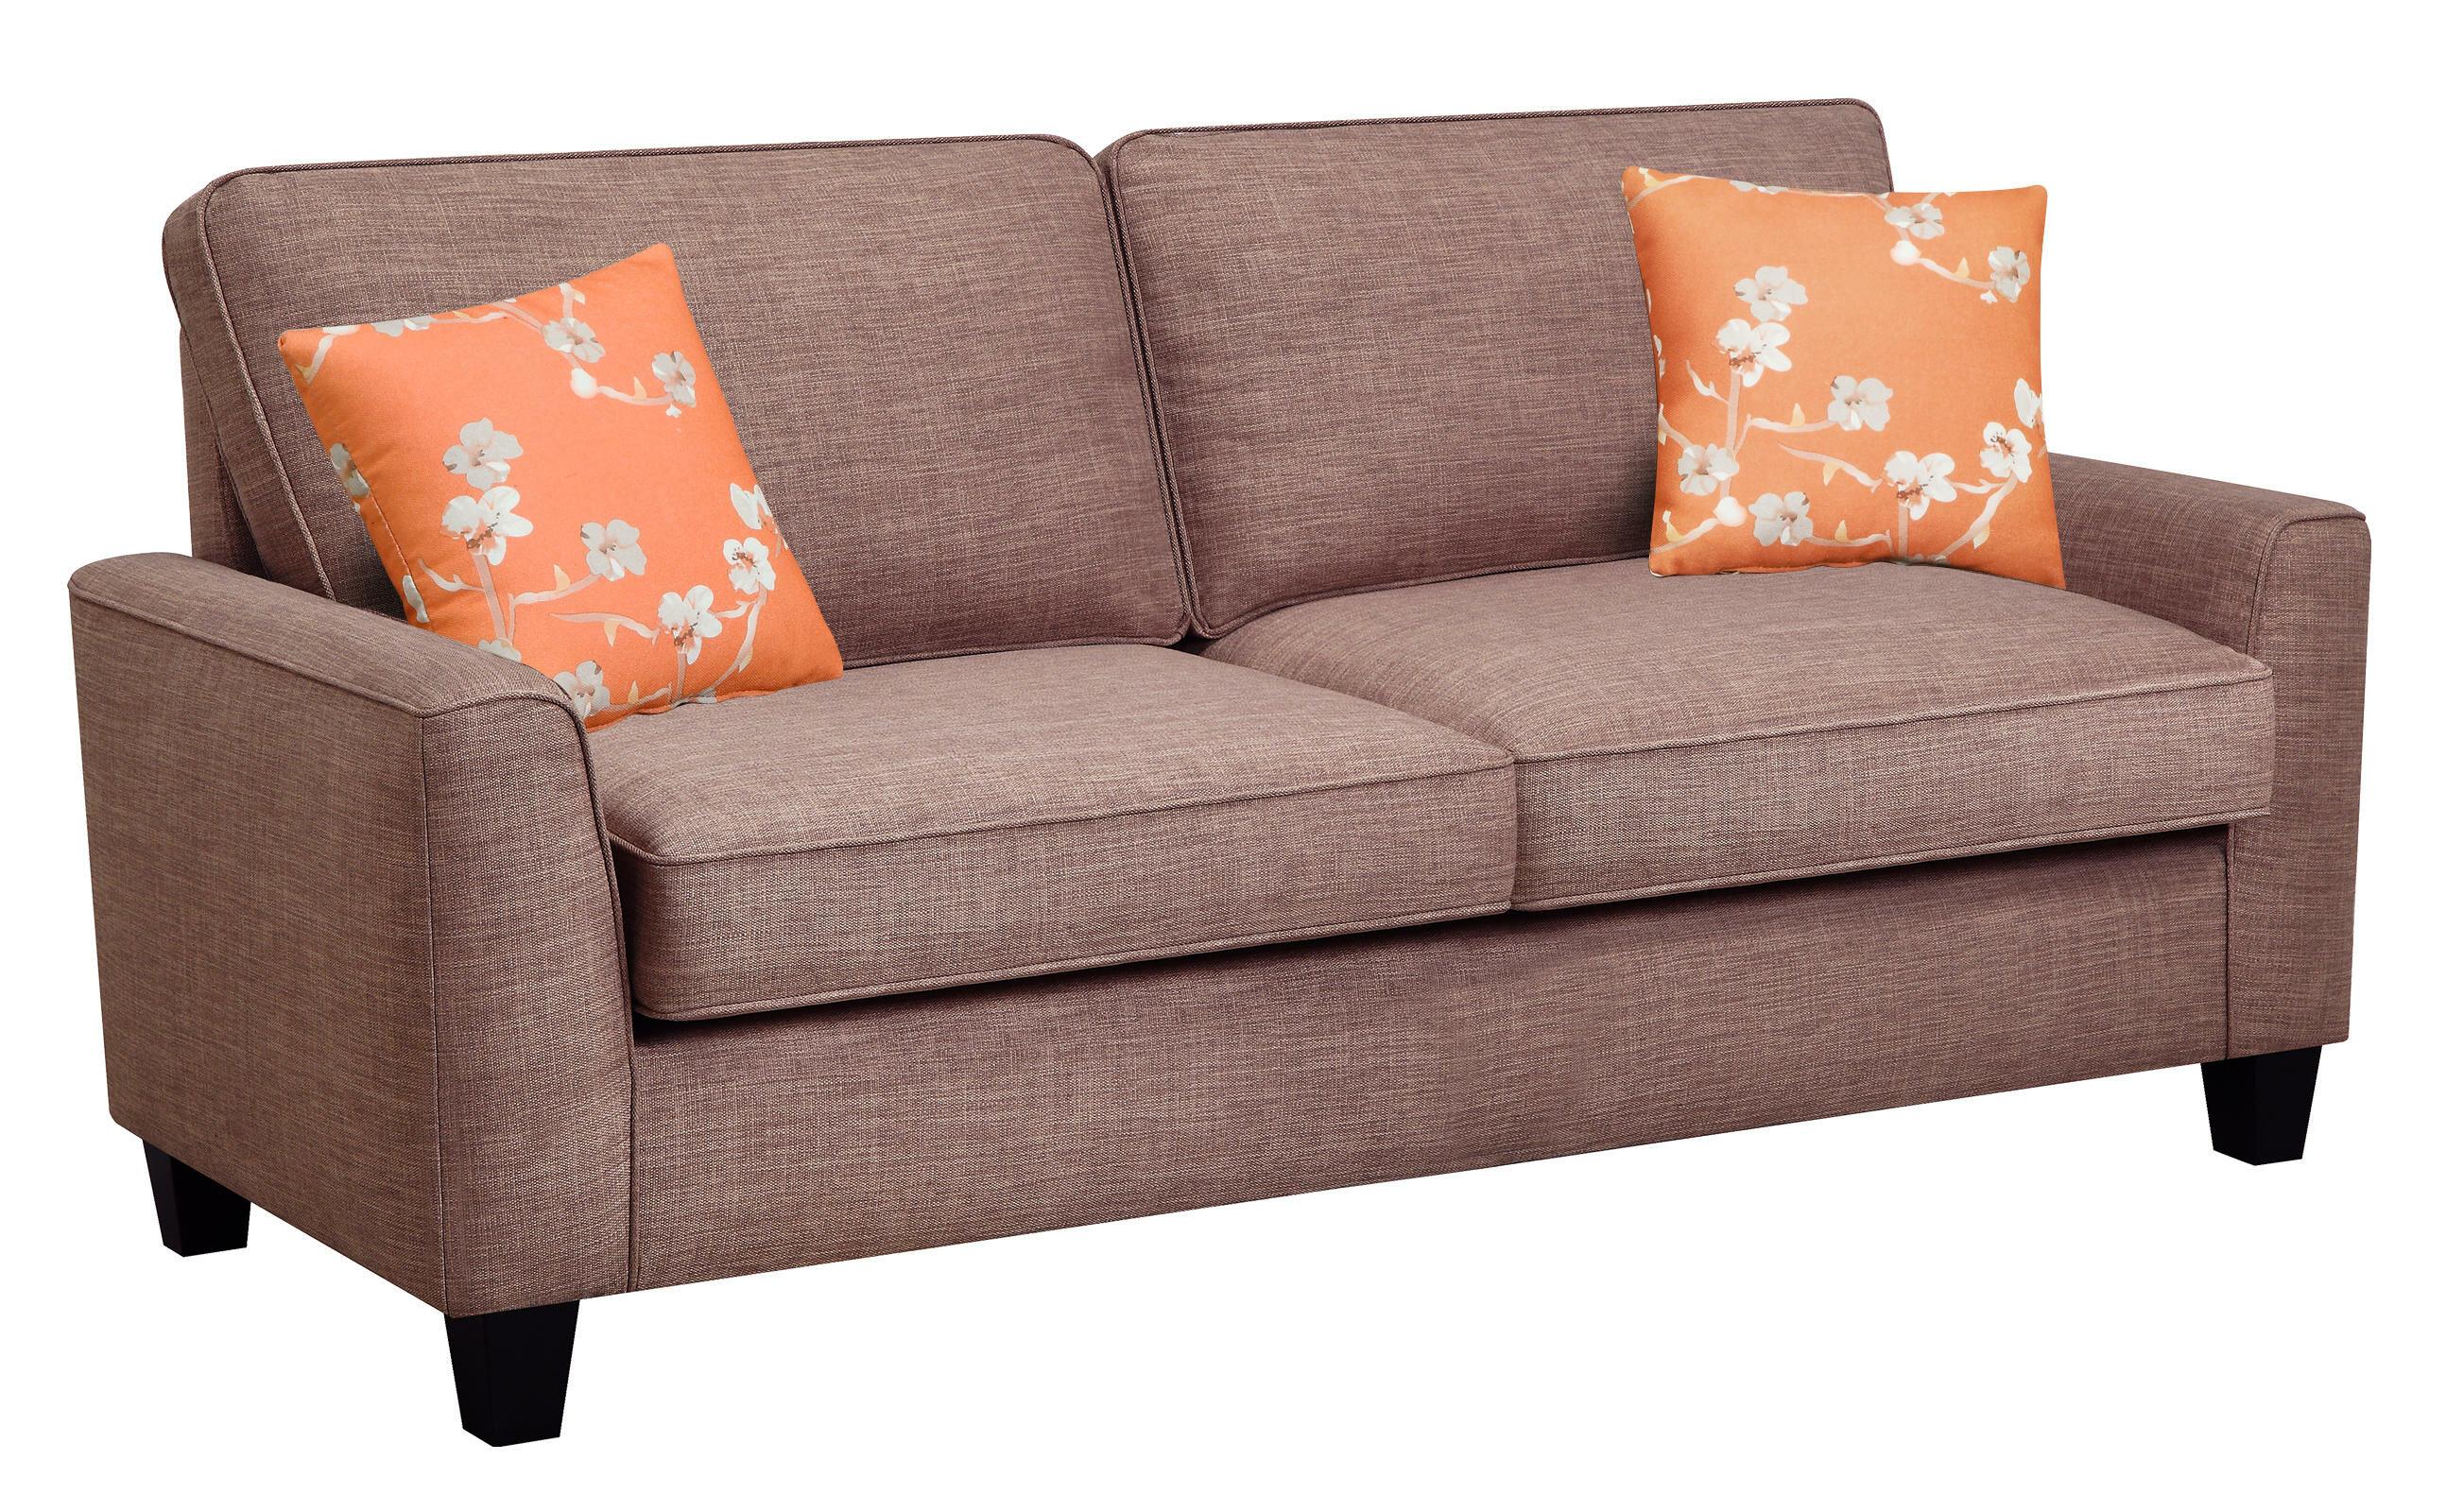 Serta At Home Astoria Sofa U0026 Reviews   Wayfair